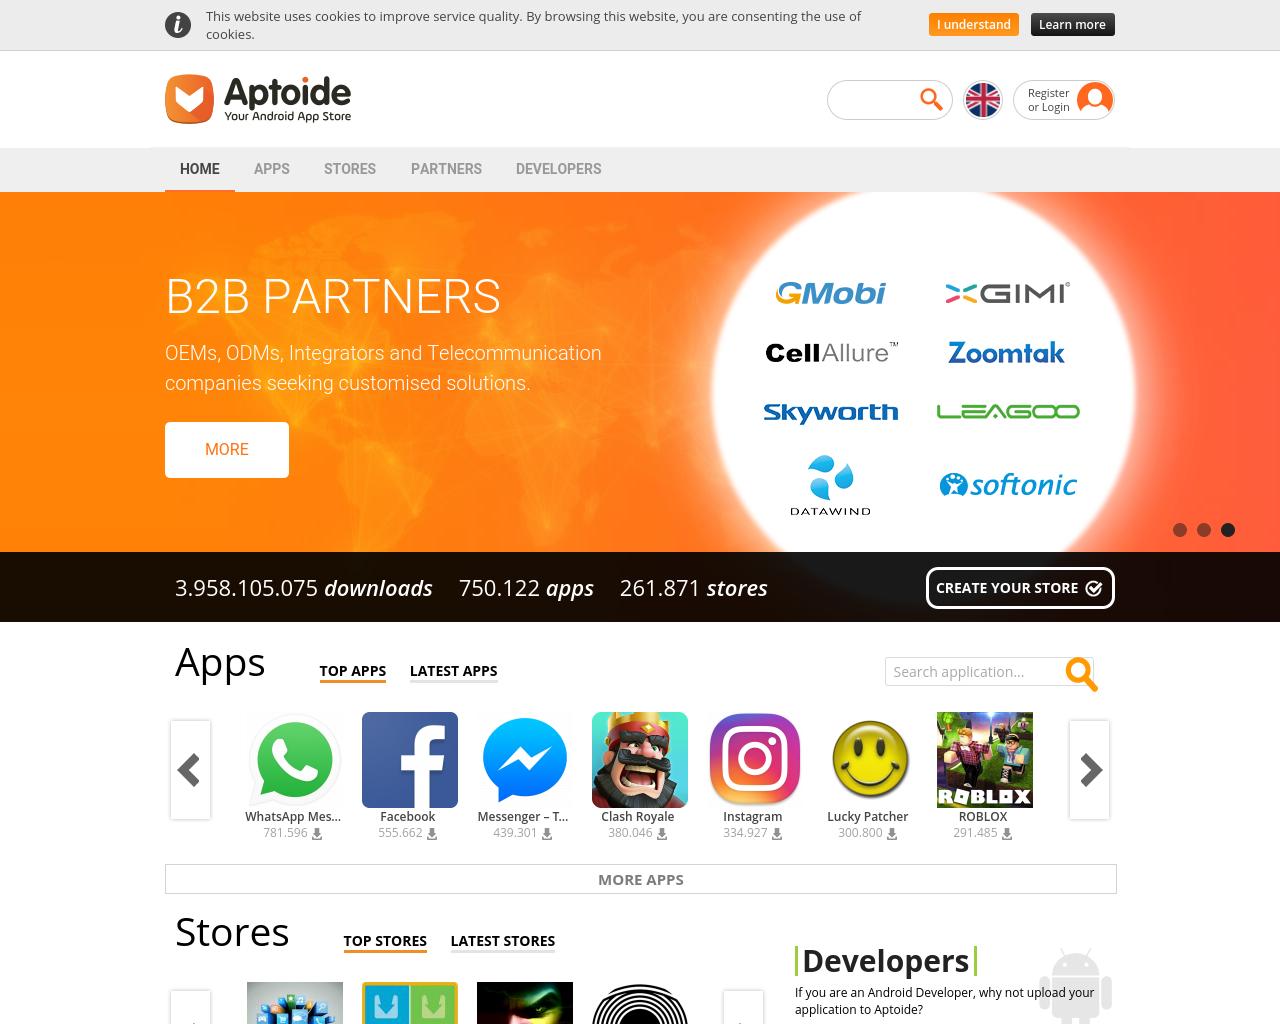 APTOIDE-Advertising-Reviews-Pricing